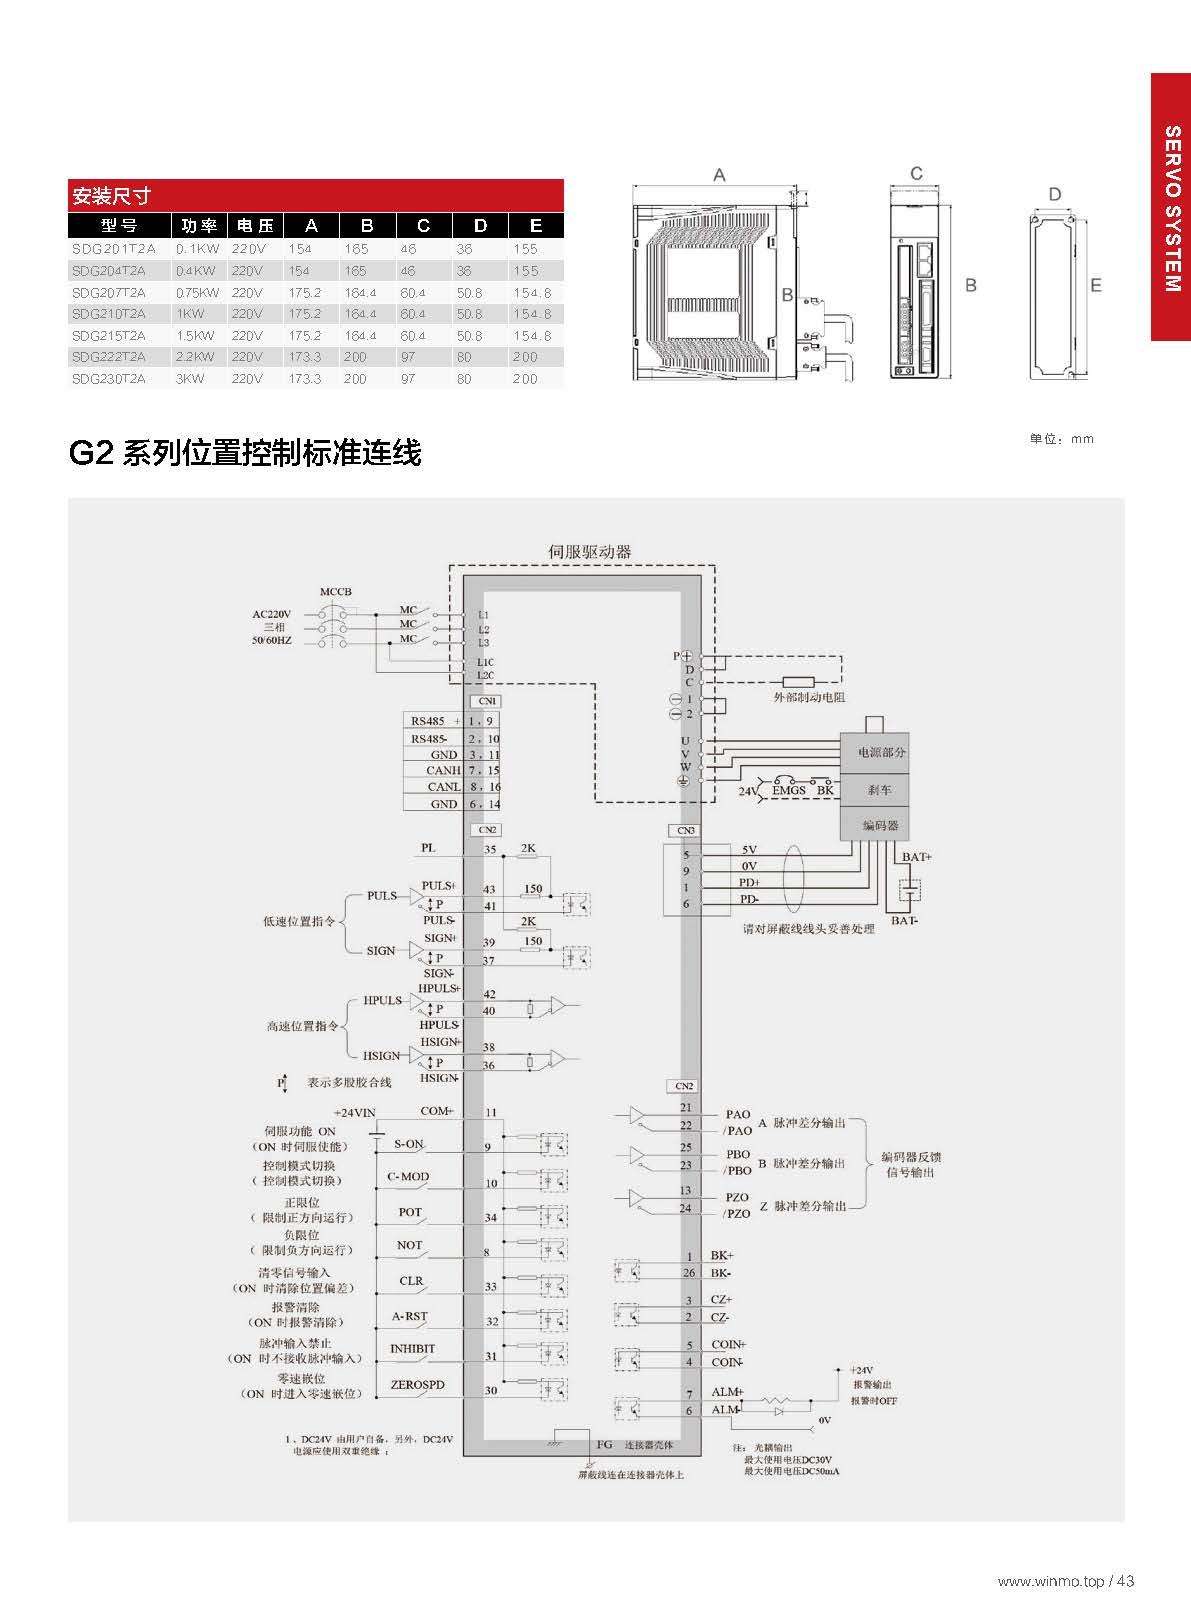 g2系列伺服驱动器